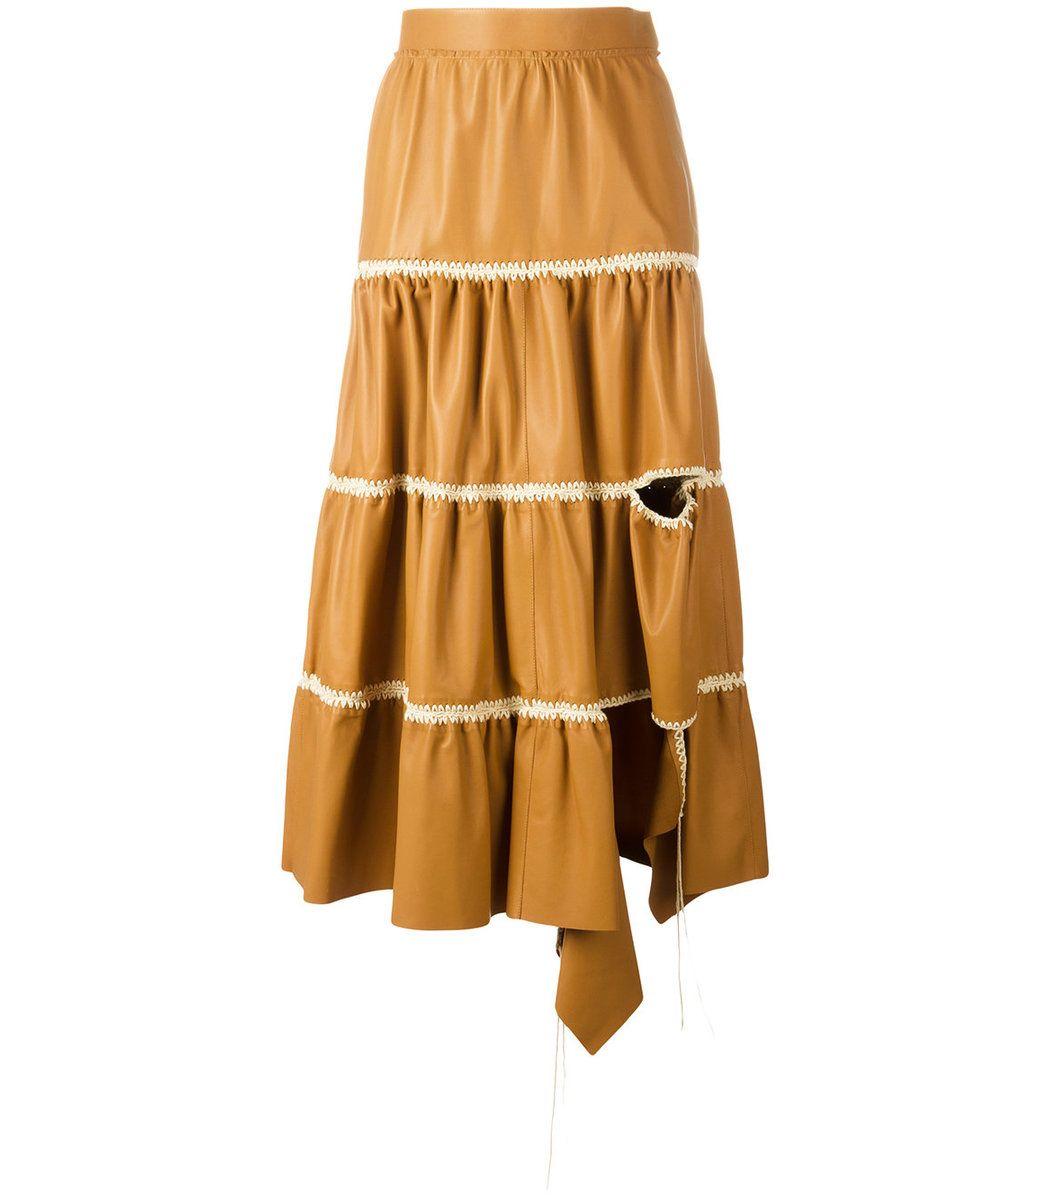 6de8e808c36 LOEWE Yellow Orange Cut-Out Ruffled Skirt. #loewe #cloth # | Loewe ...